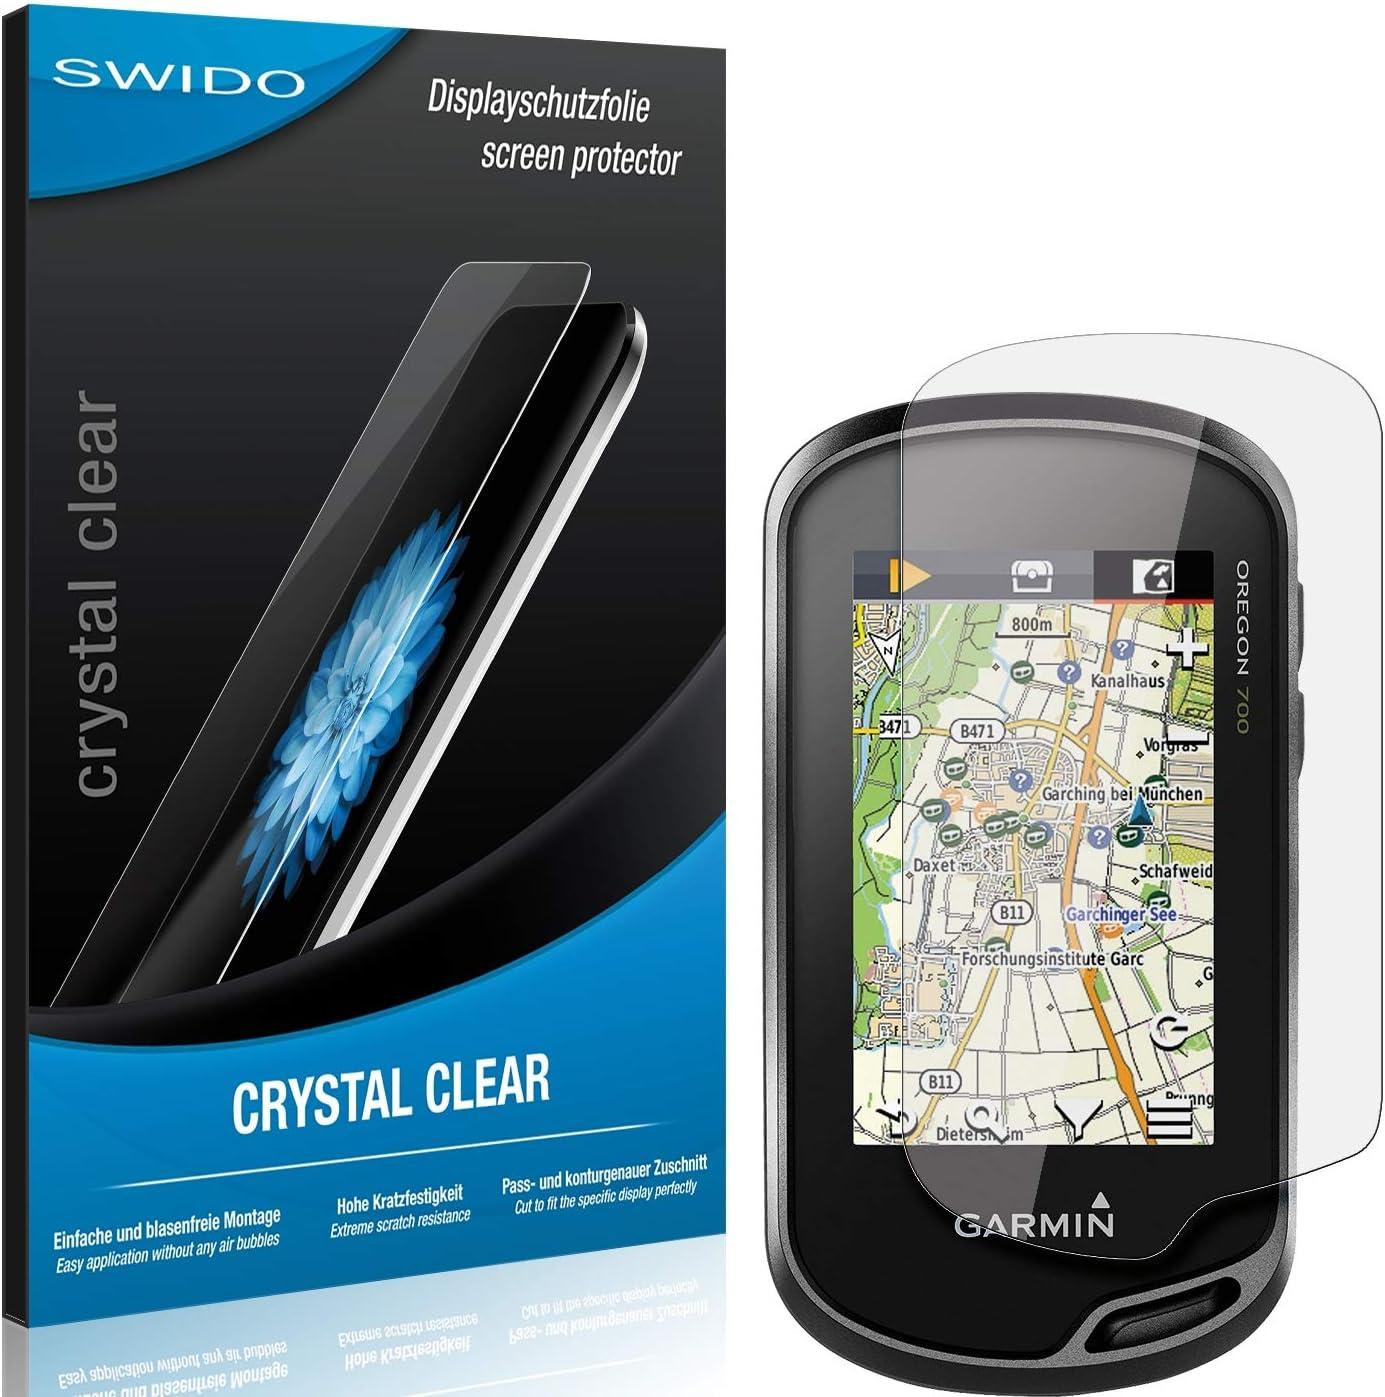 Swido Schutzfolie Für Garmin Oregon 700 Kristall Klar Elektronik